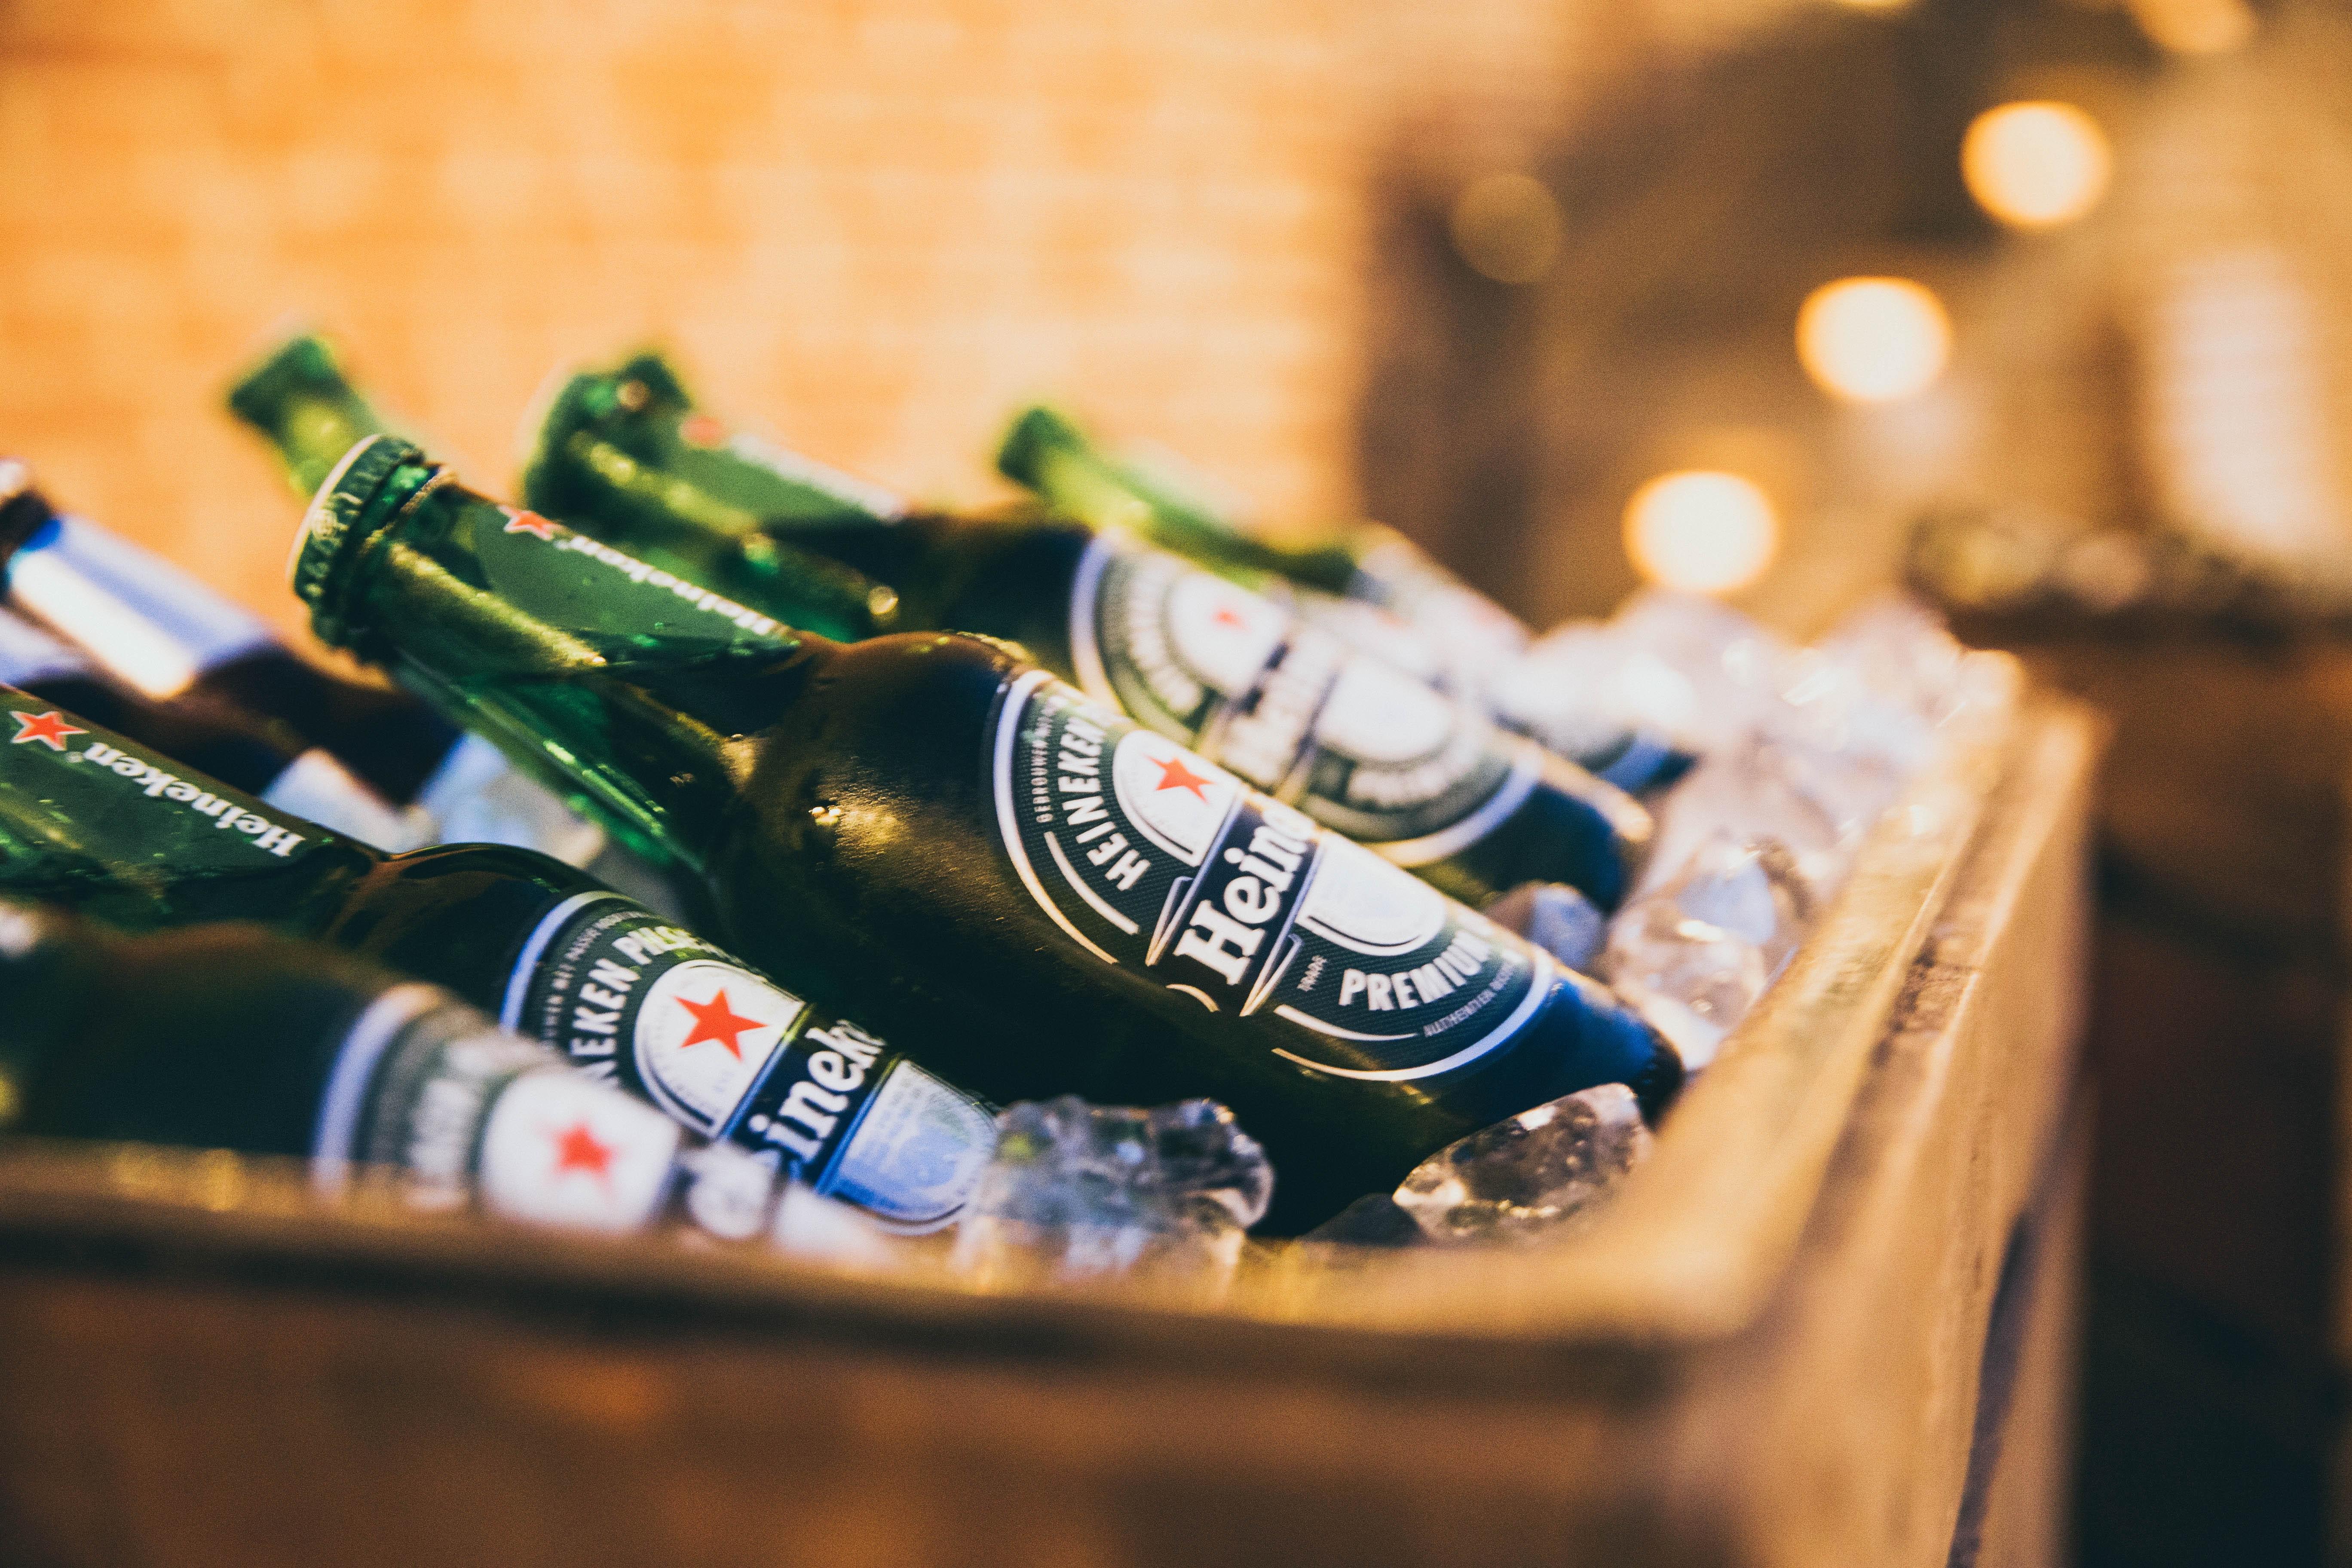 World of Heineken, Things to Do in Amsterdam in October